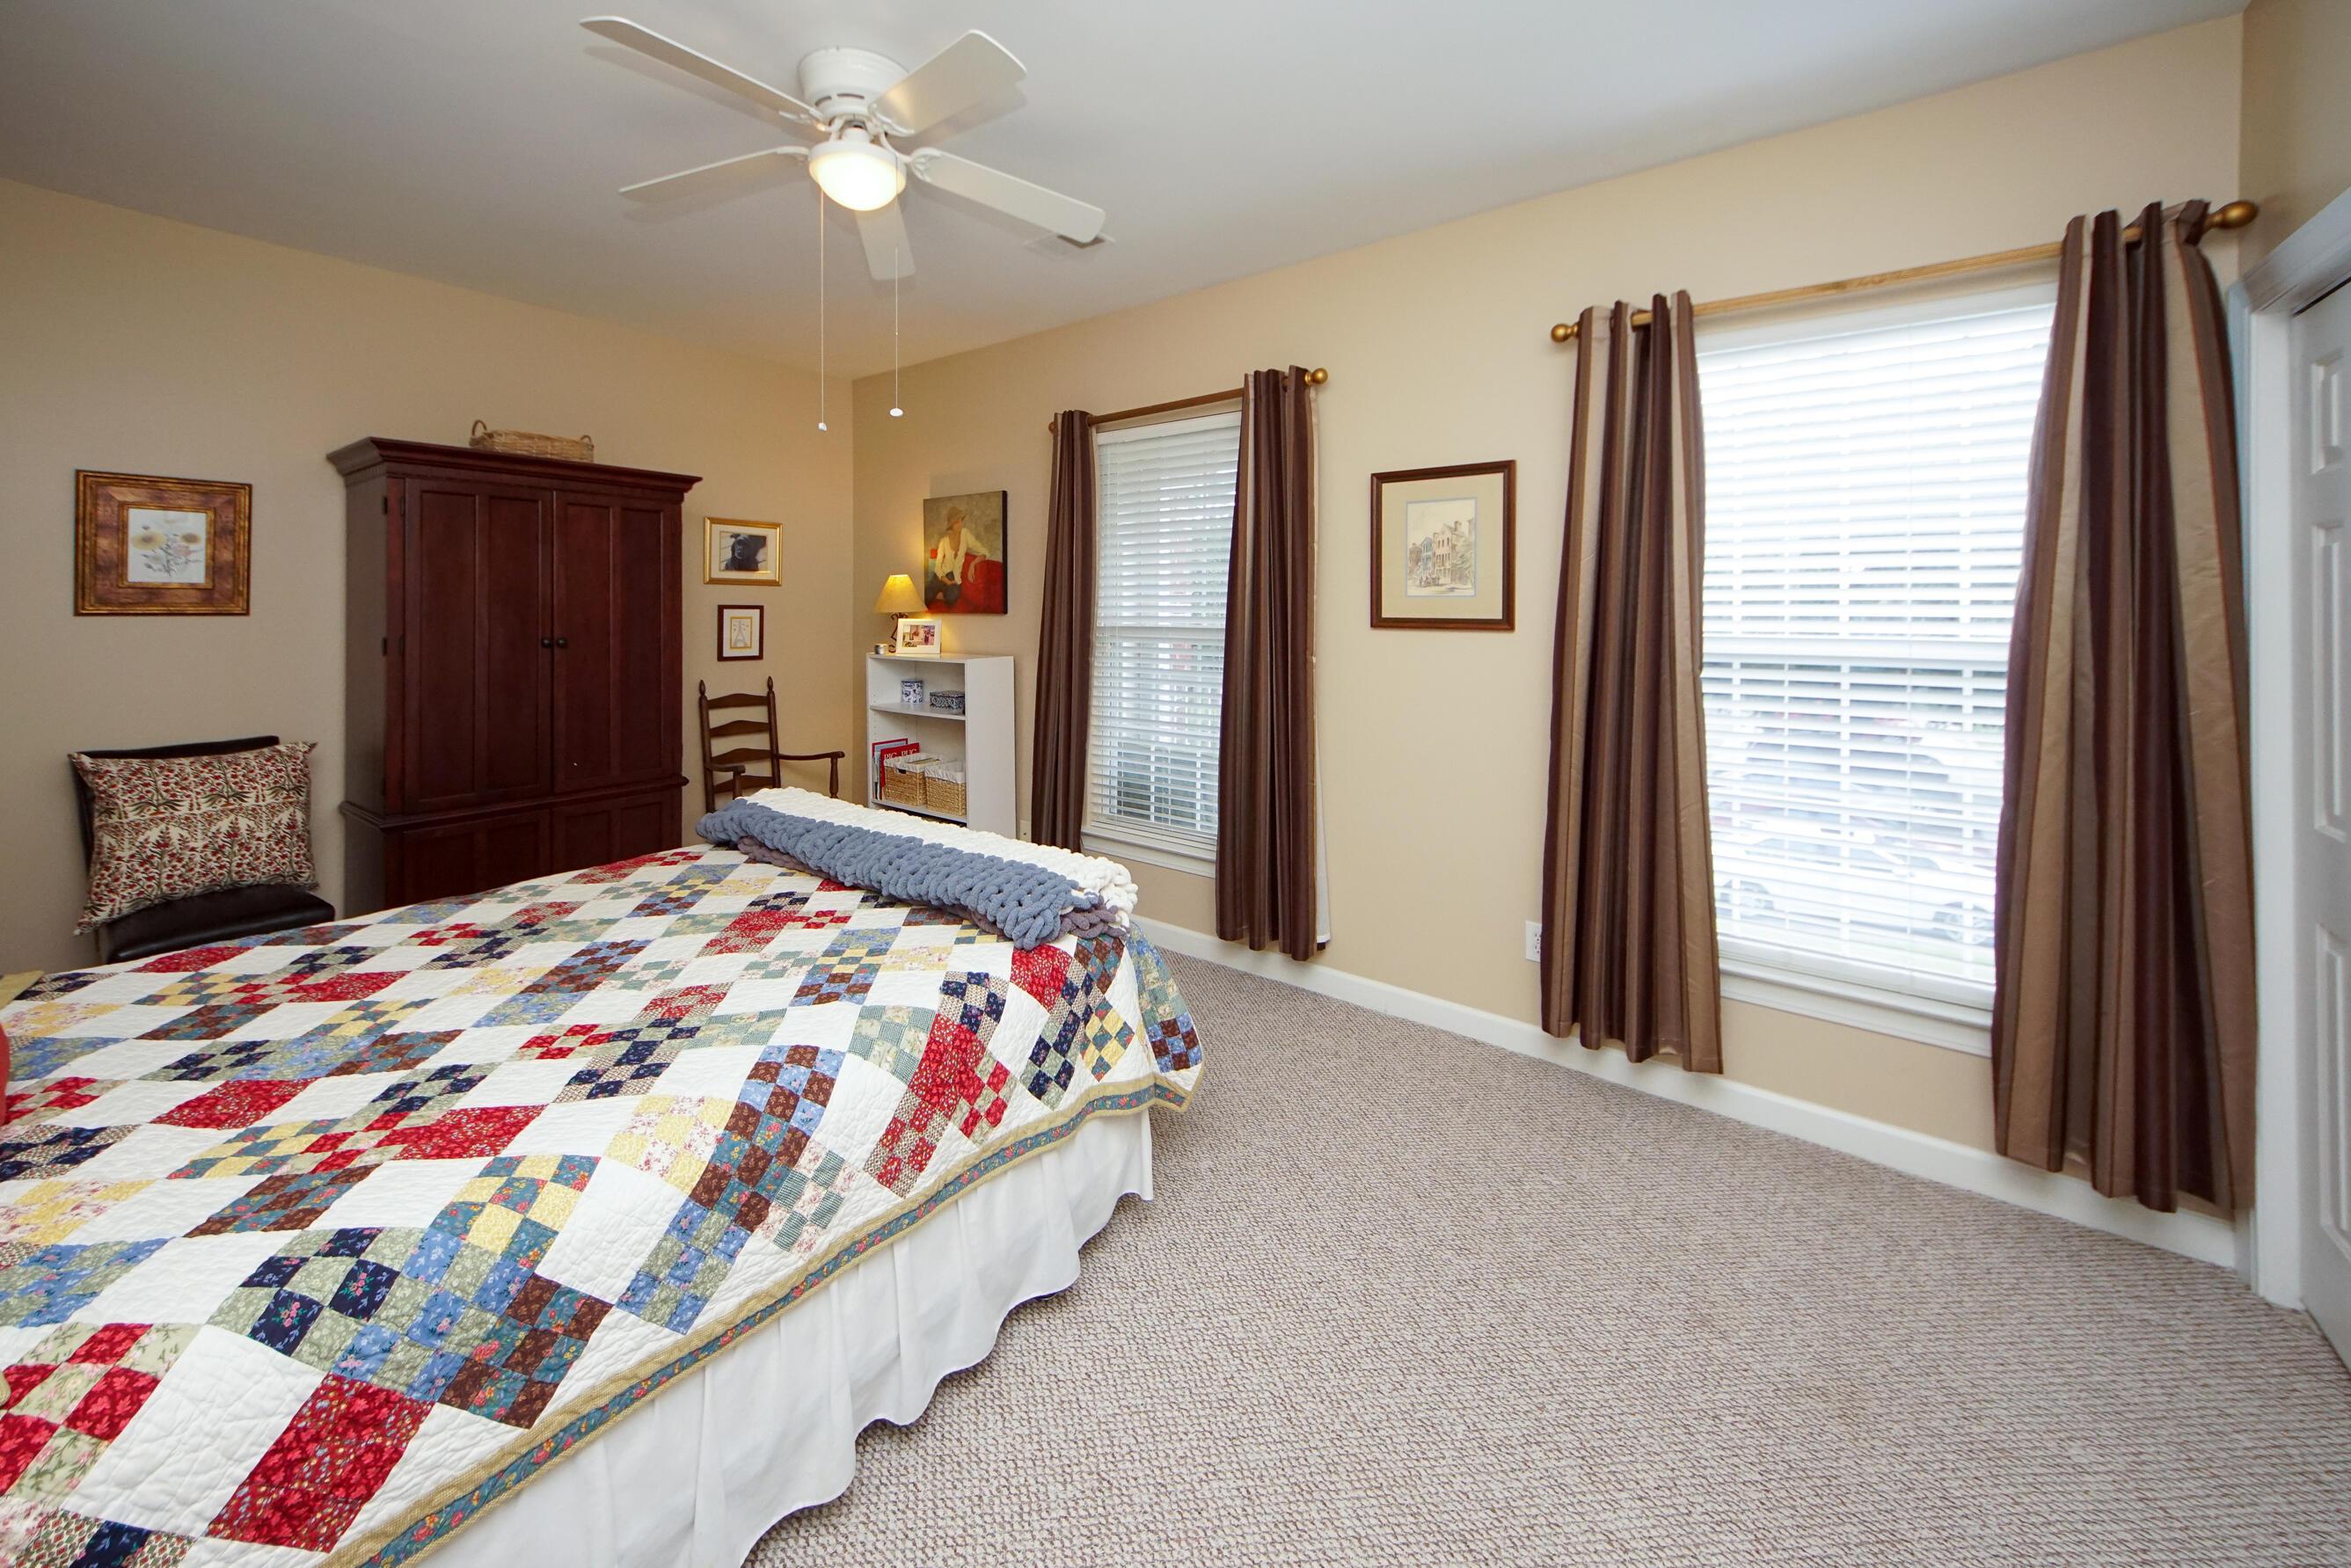 Dunes West Homes For Sale - 1631 Camfield, Mount Pleasant, SC - 30